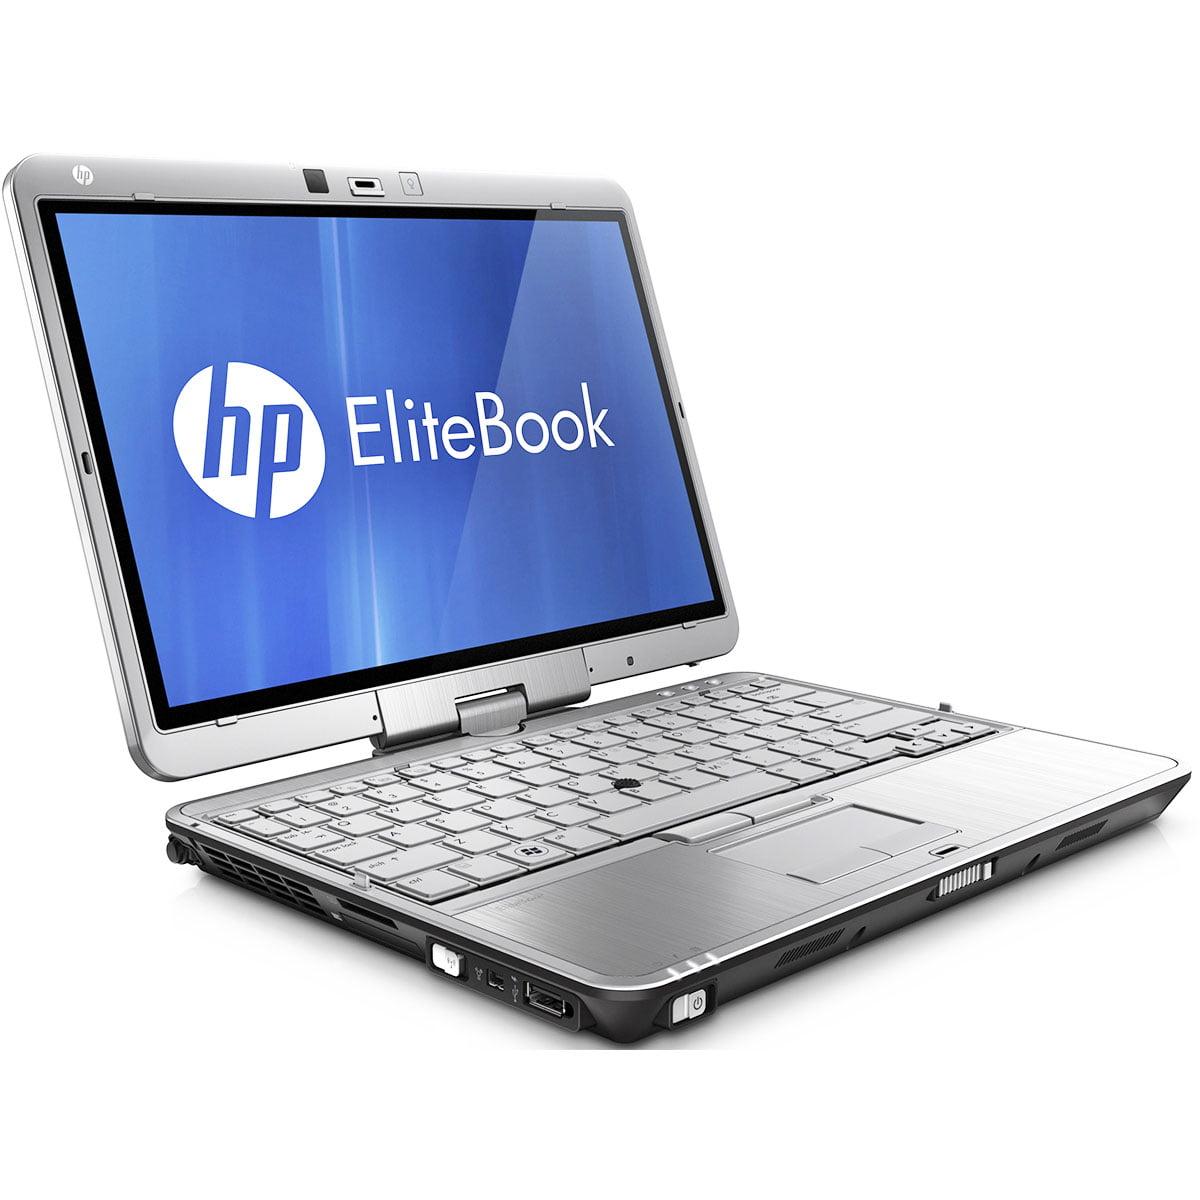 HP 2760p 2.7GHz i7 8GB 160SSD Windows 10 Pro 64 Tablet PC...